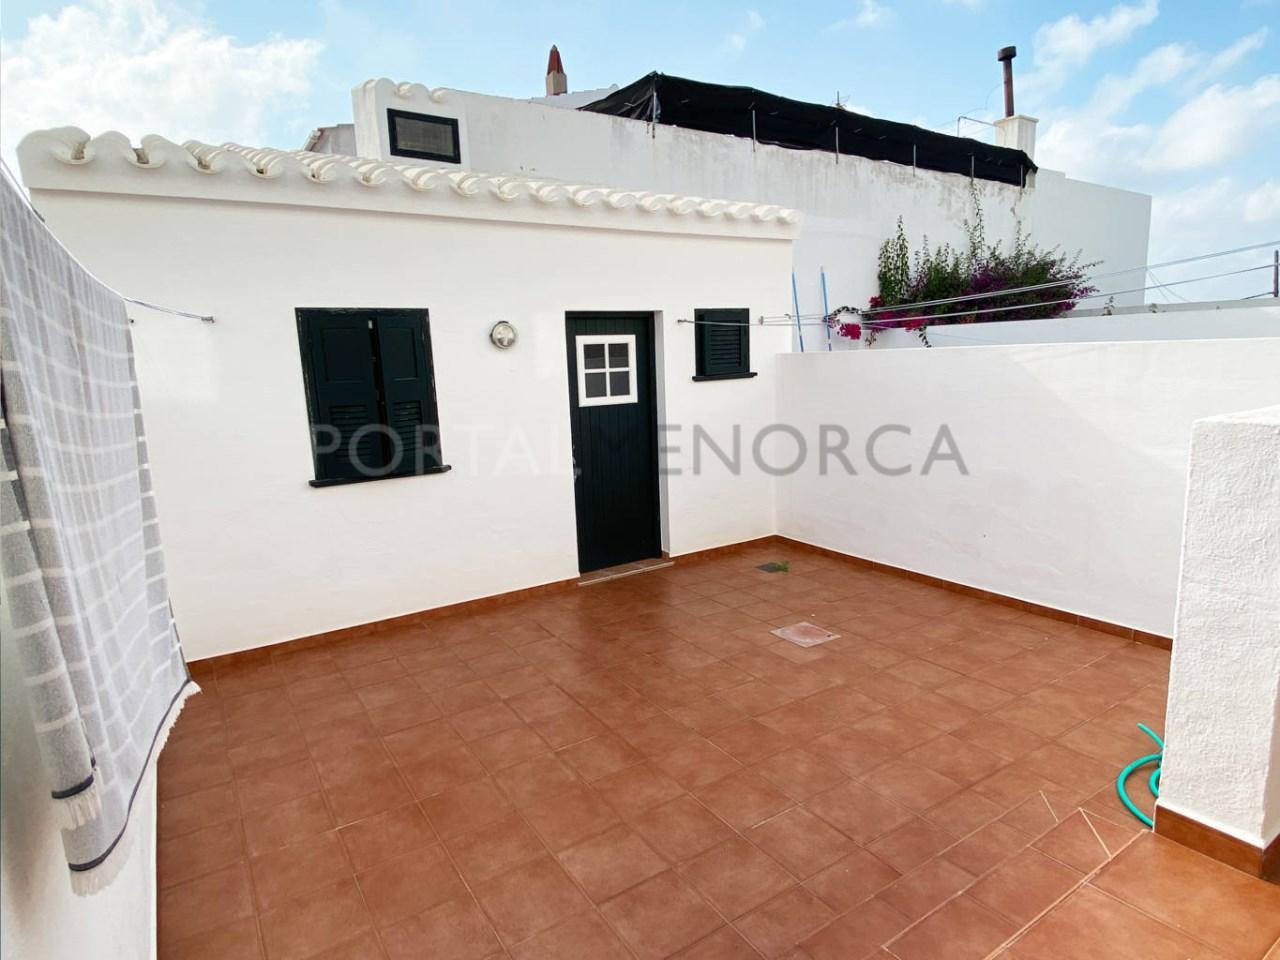 Duplex in Fornells_terrace